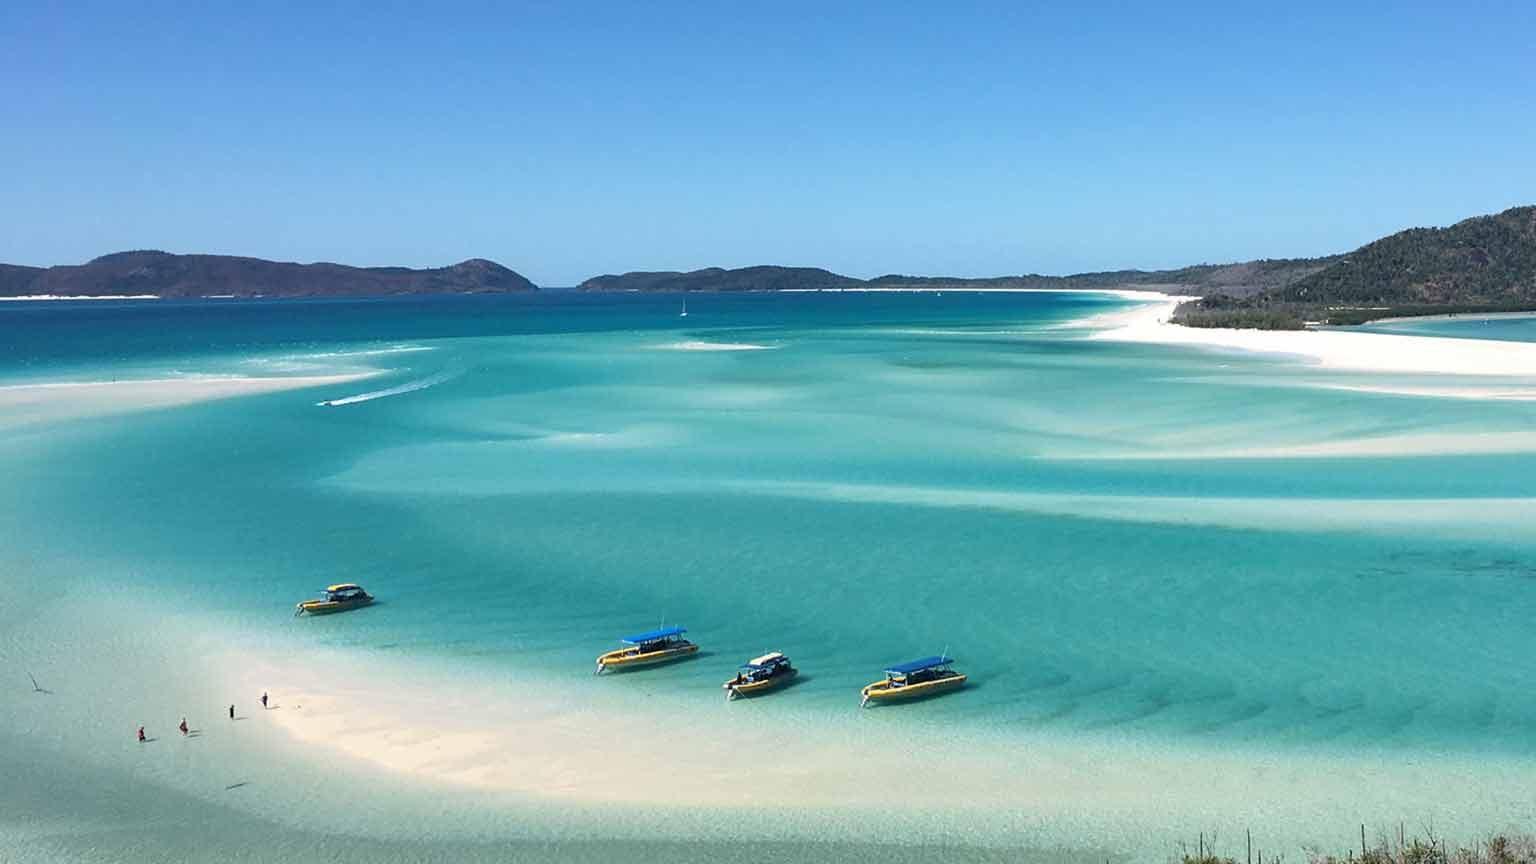 Whitehaven Beach, Whitsundays, Queensland